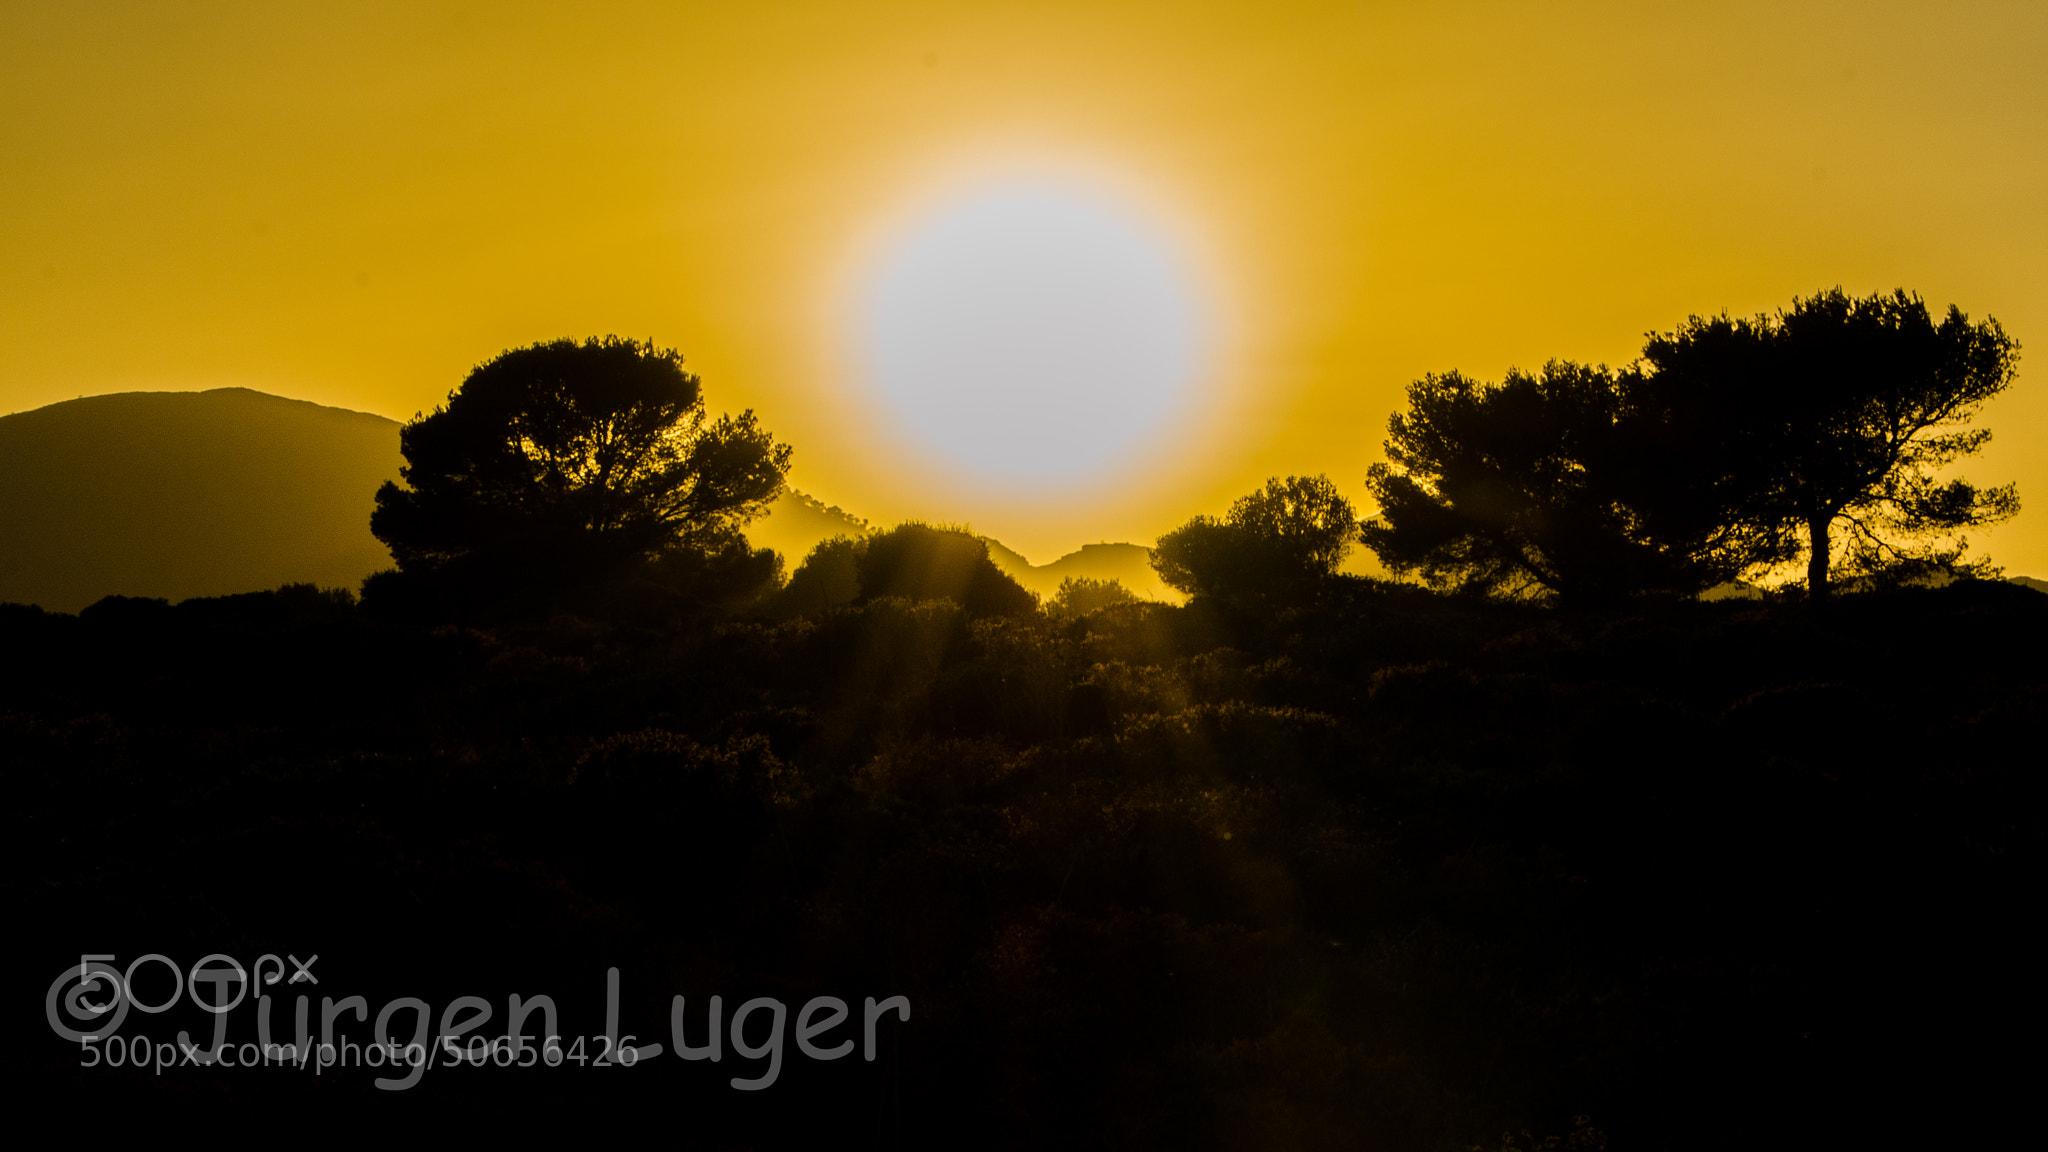 Photograph Mallorca by Jürgen Luger on 500px